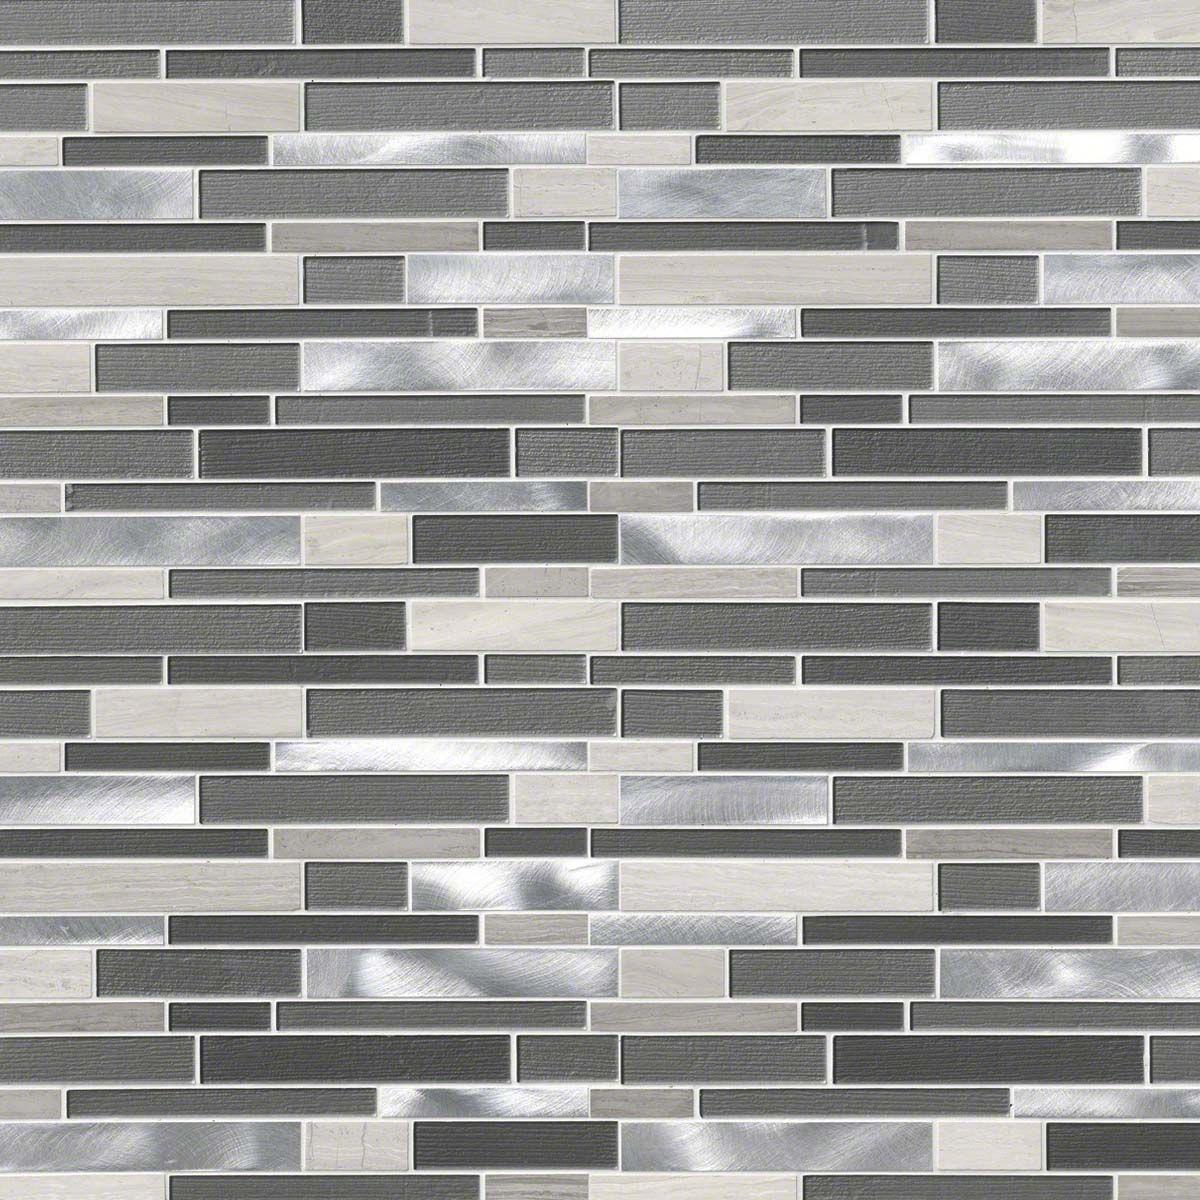 Urban loft interlocking pattern 4mm mosaics kitchen pinterest urban loft lofts and urban - Backsplash tile patterns ...